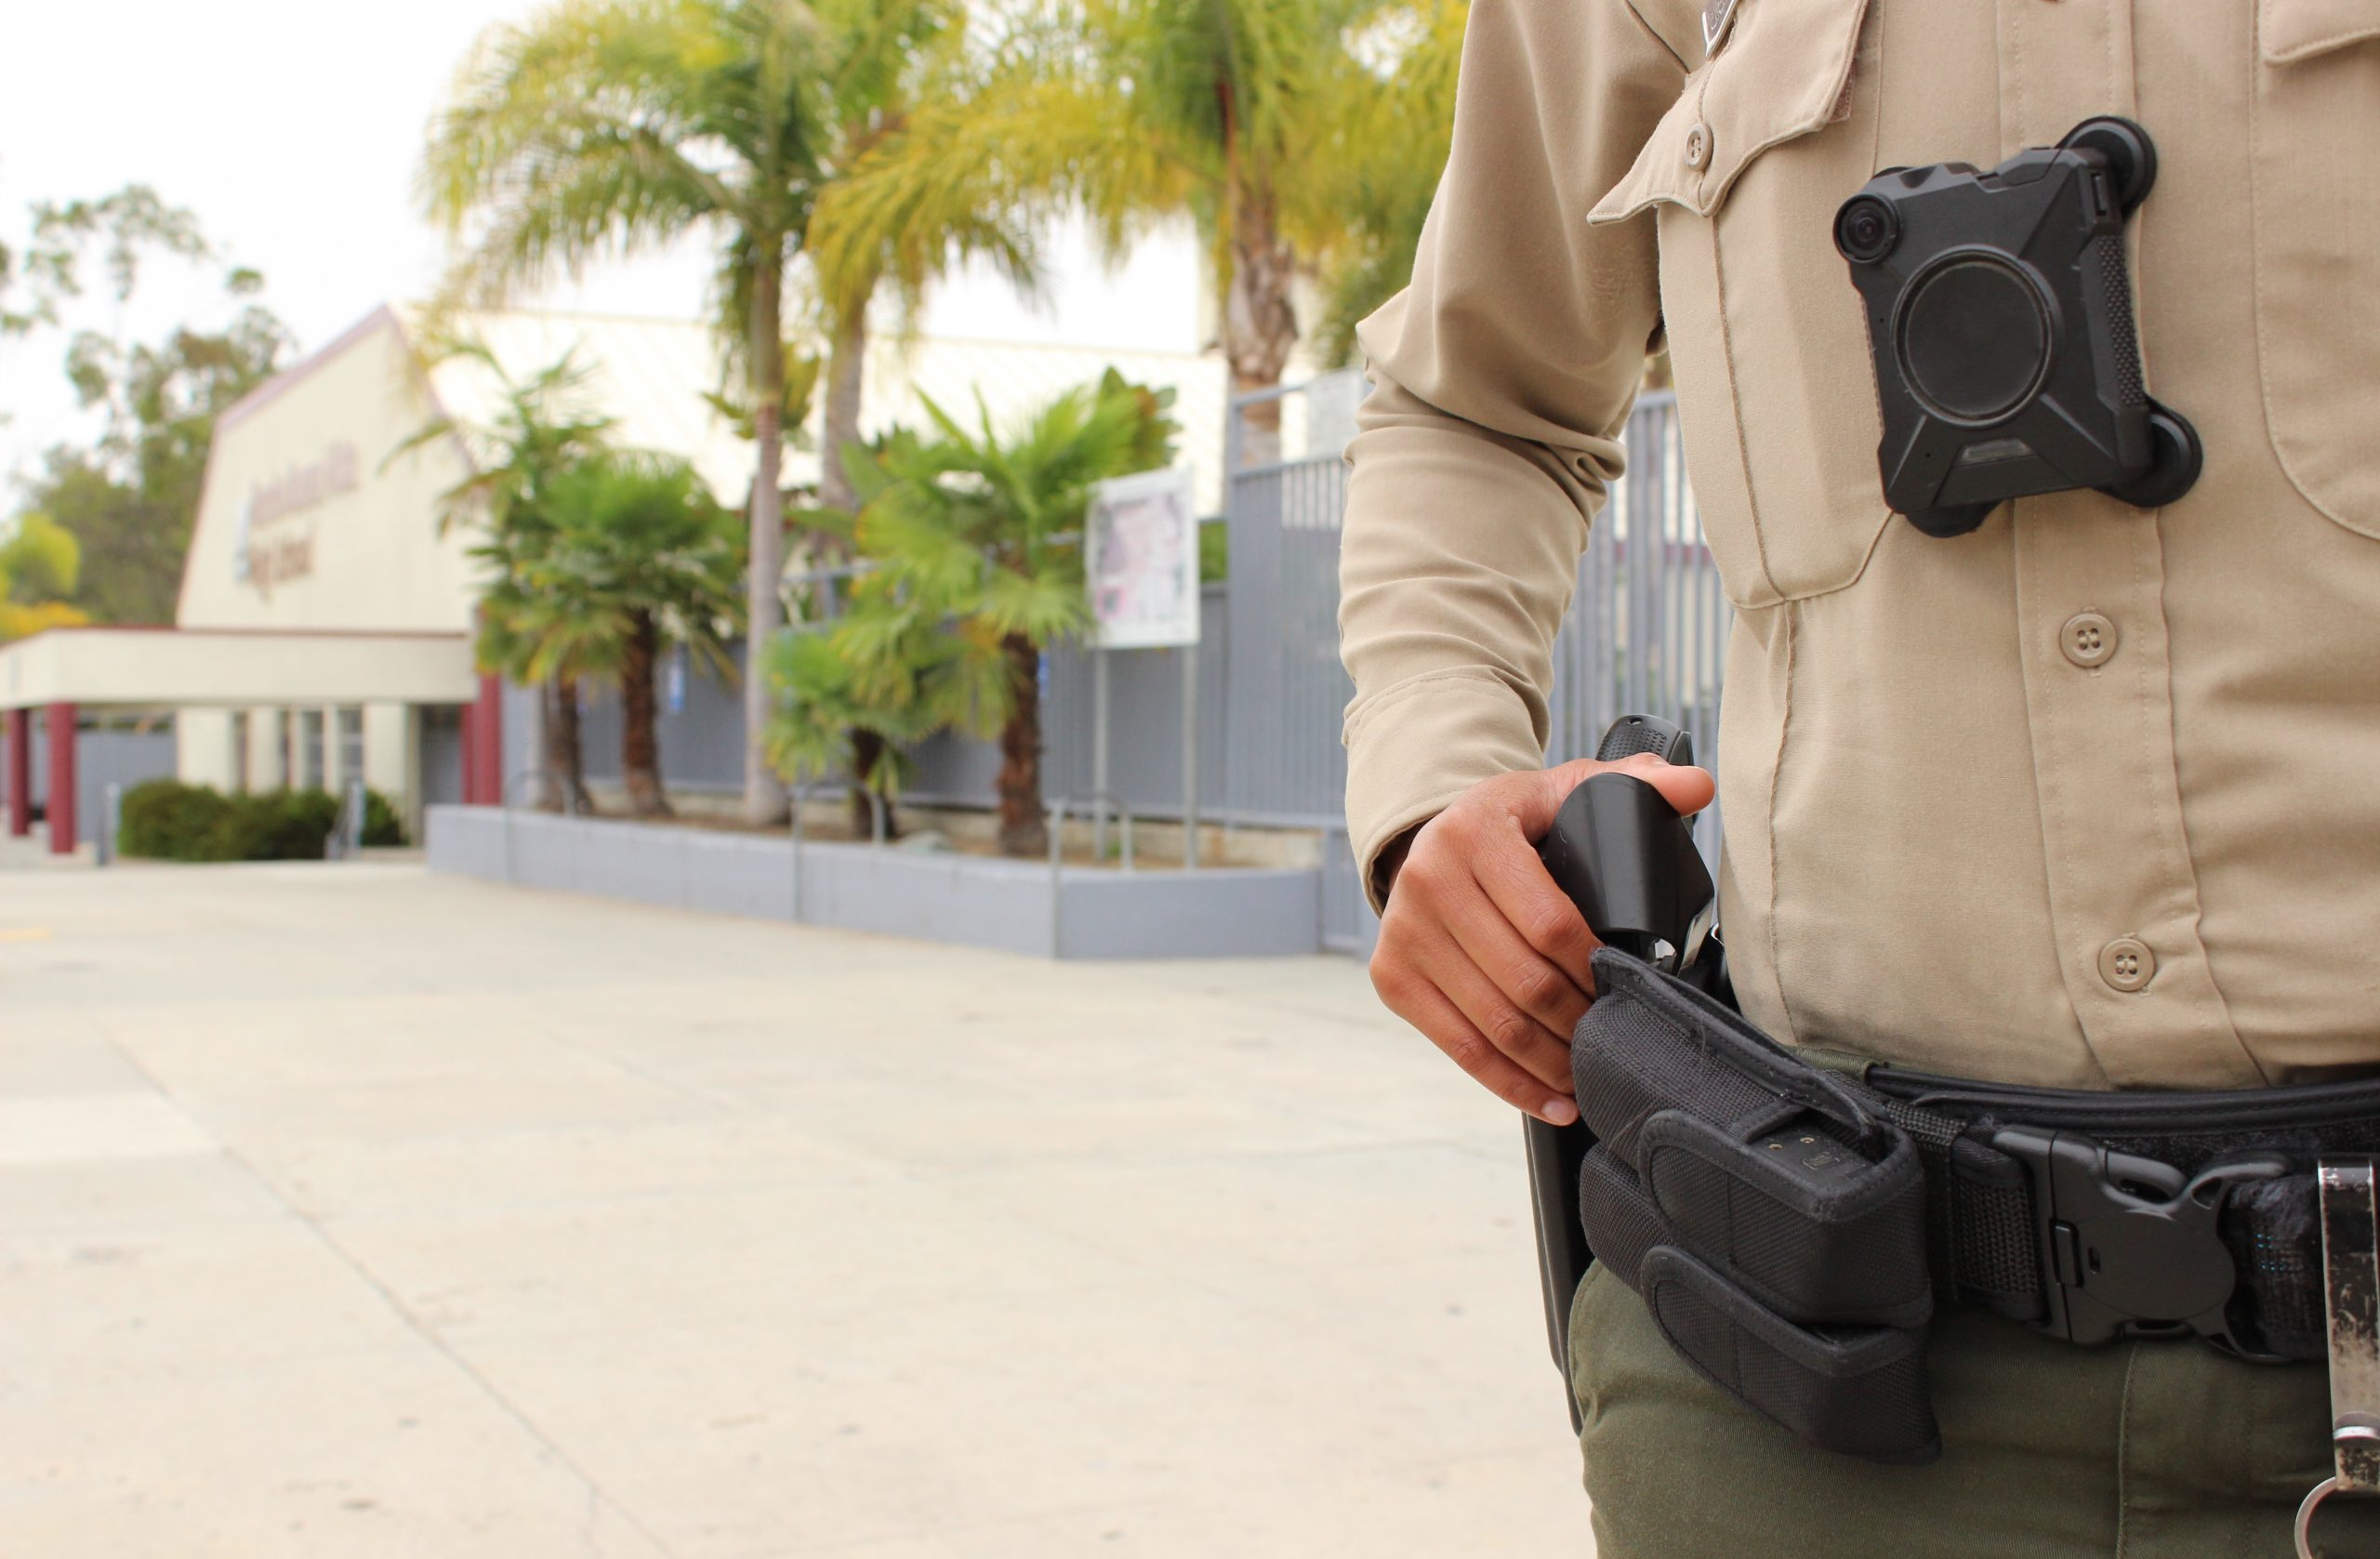 police officer gun on hip